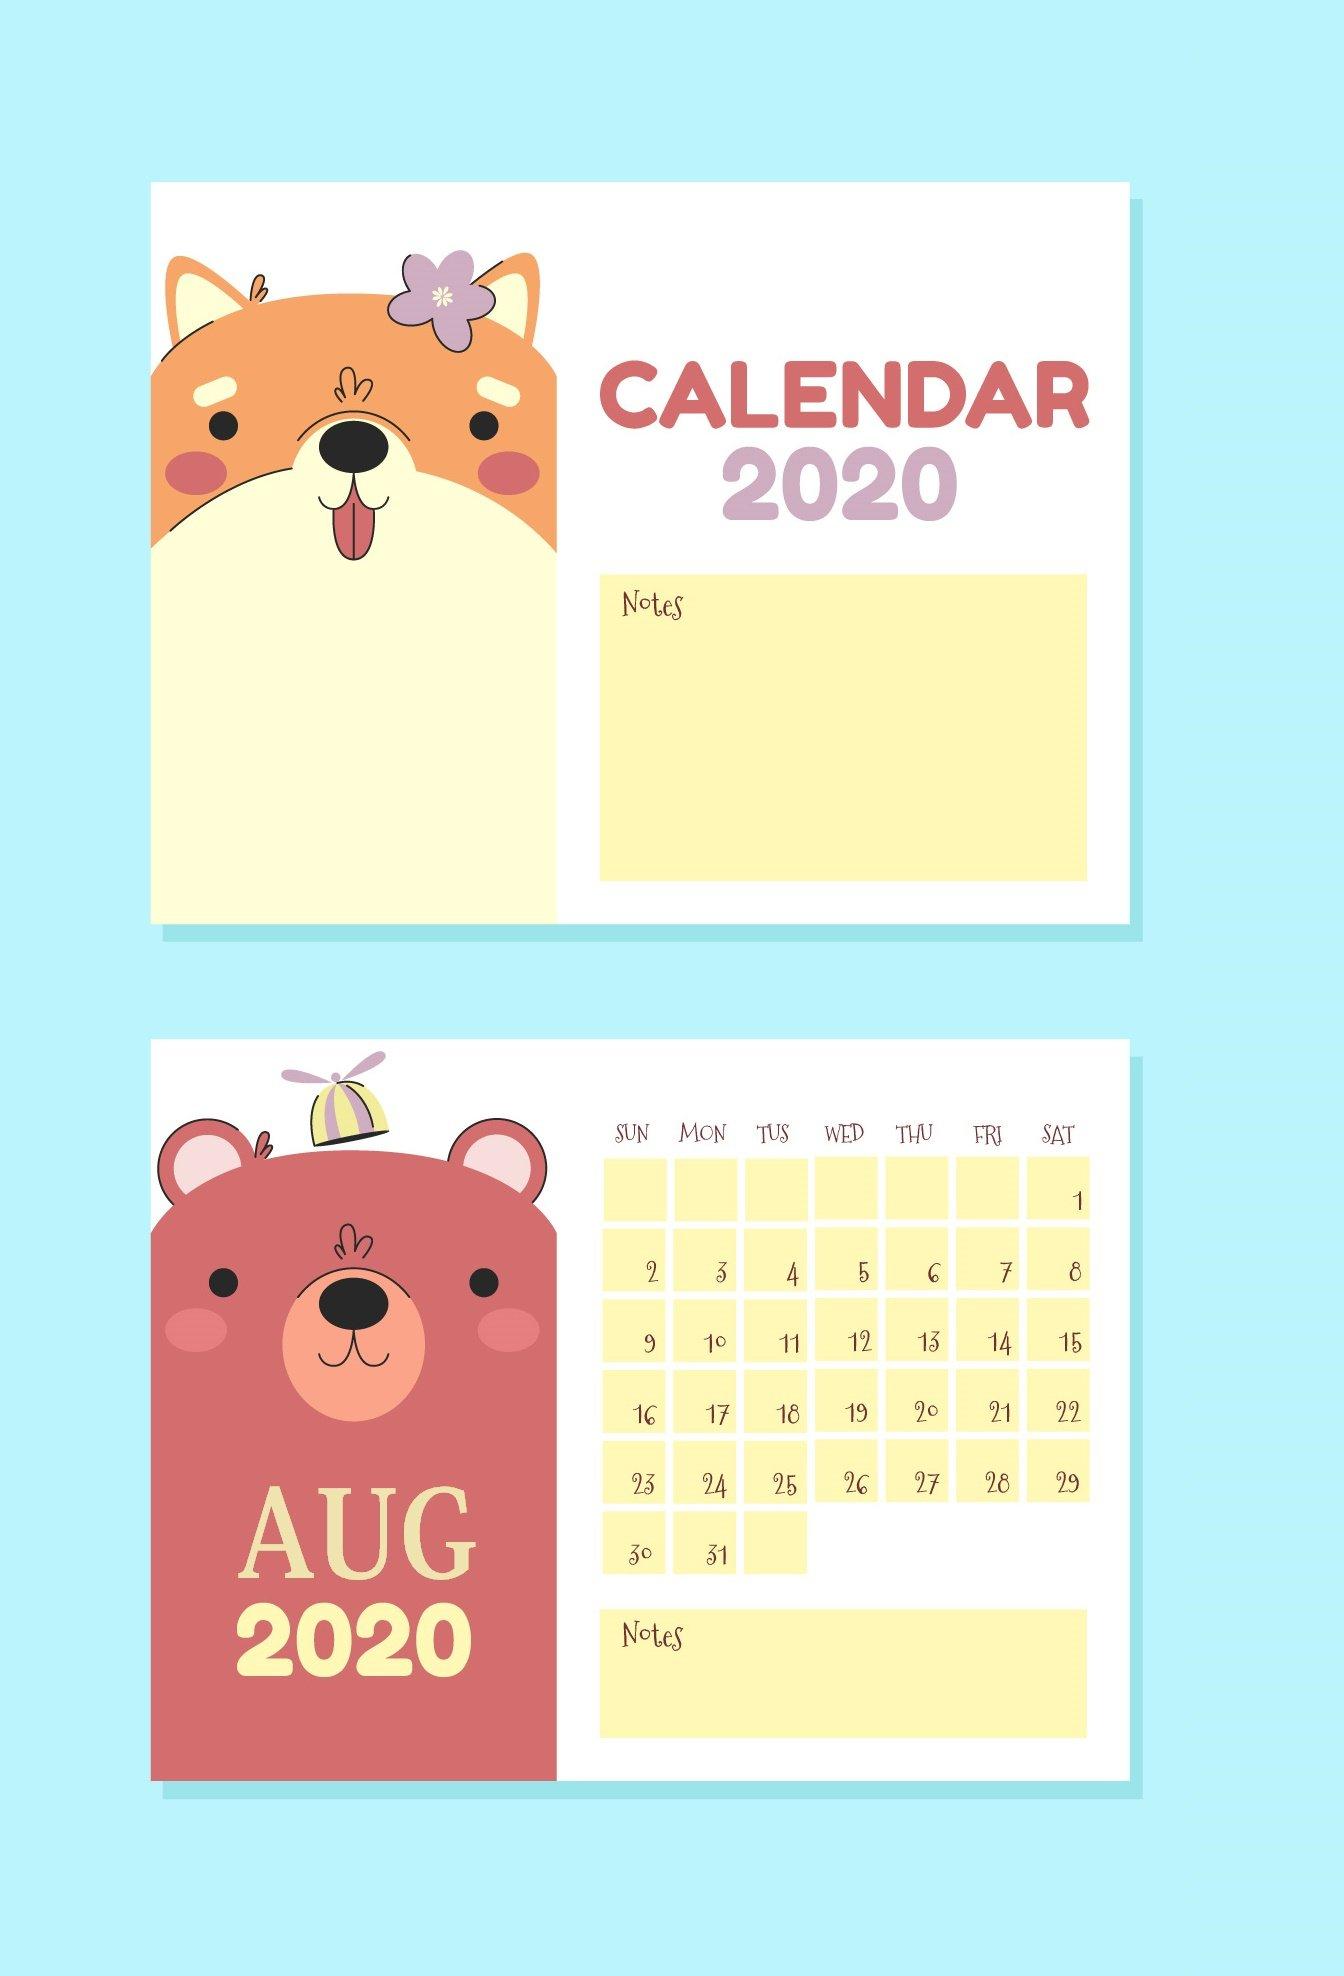 Free August 2020 Wall Calendar   Calendar 2020 Free 2020 Calendar With Days Counted 1 365